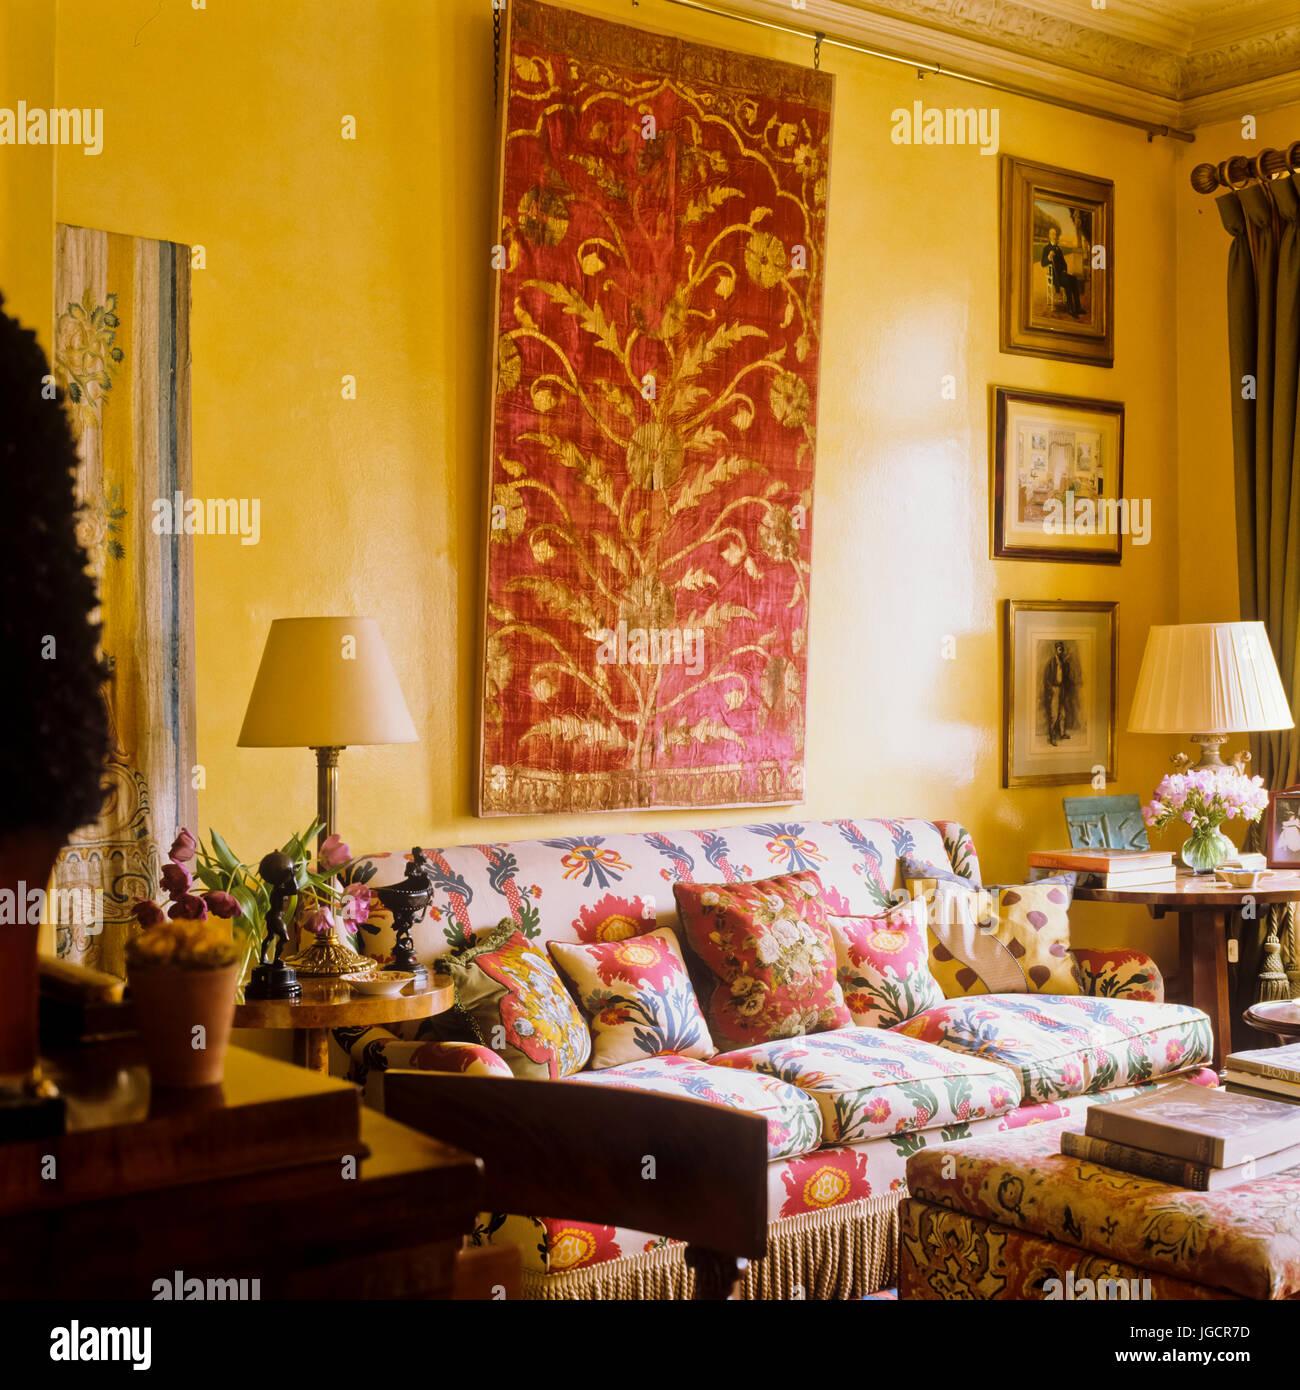 Floral Sofa Below Red Painting